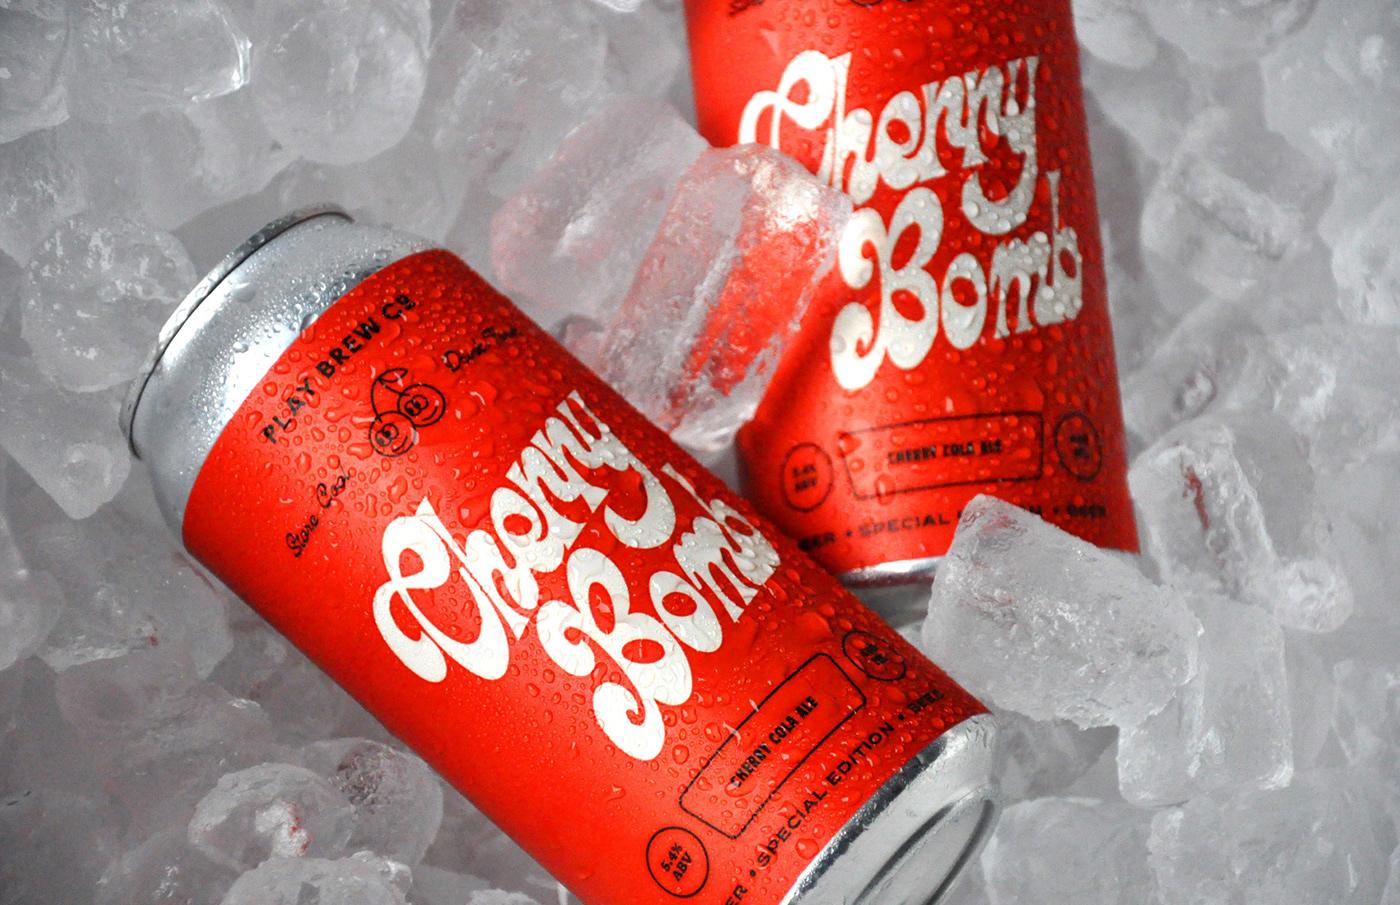 beer beer brand Beer Branding beer can branding  craft craft beer IPA Label Packaging